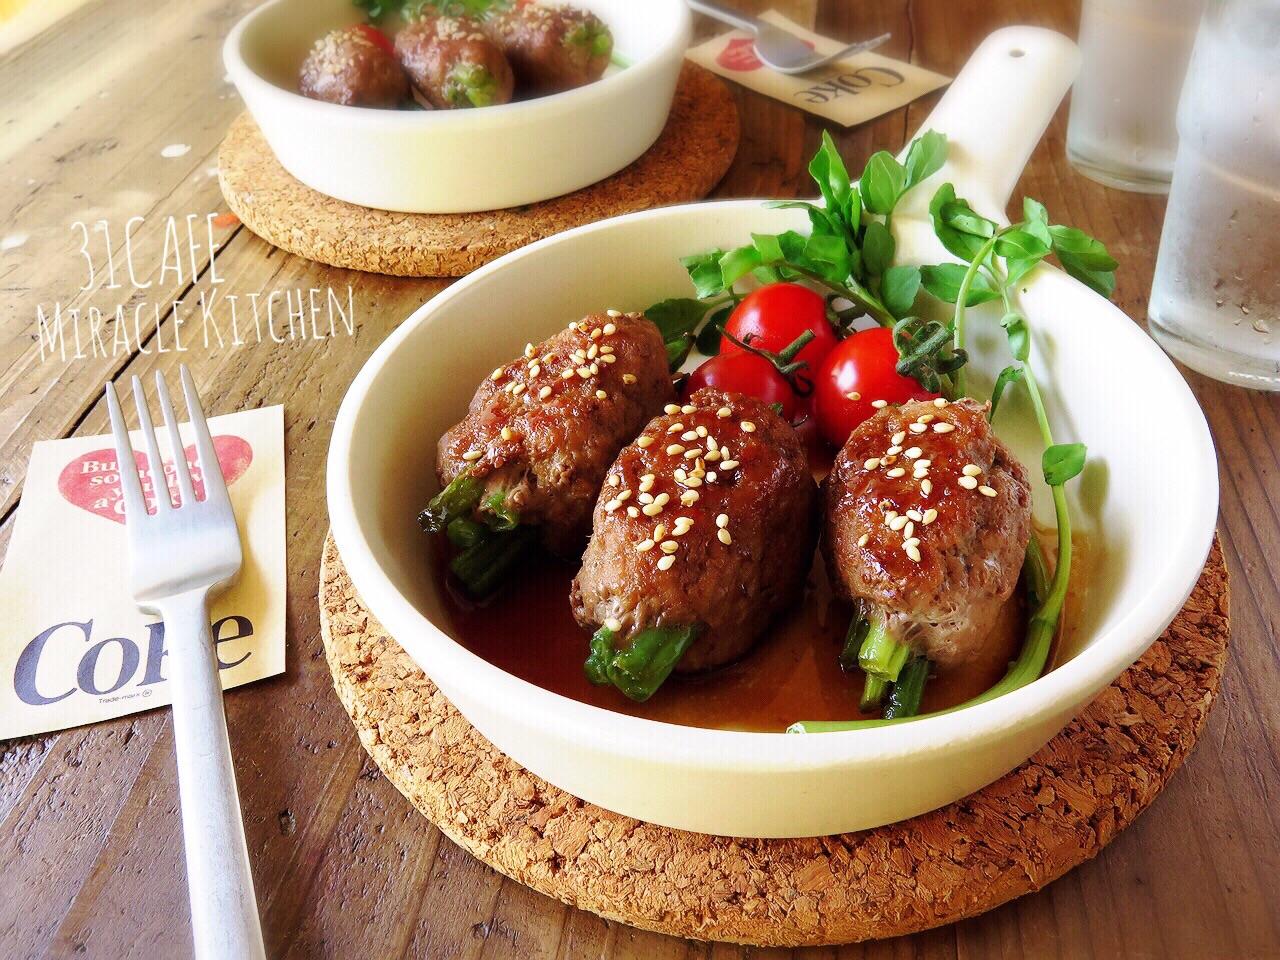 Mizukiの簡単レシピとキラキラテーブルスタイリング